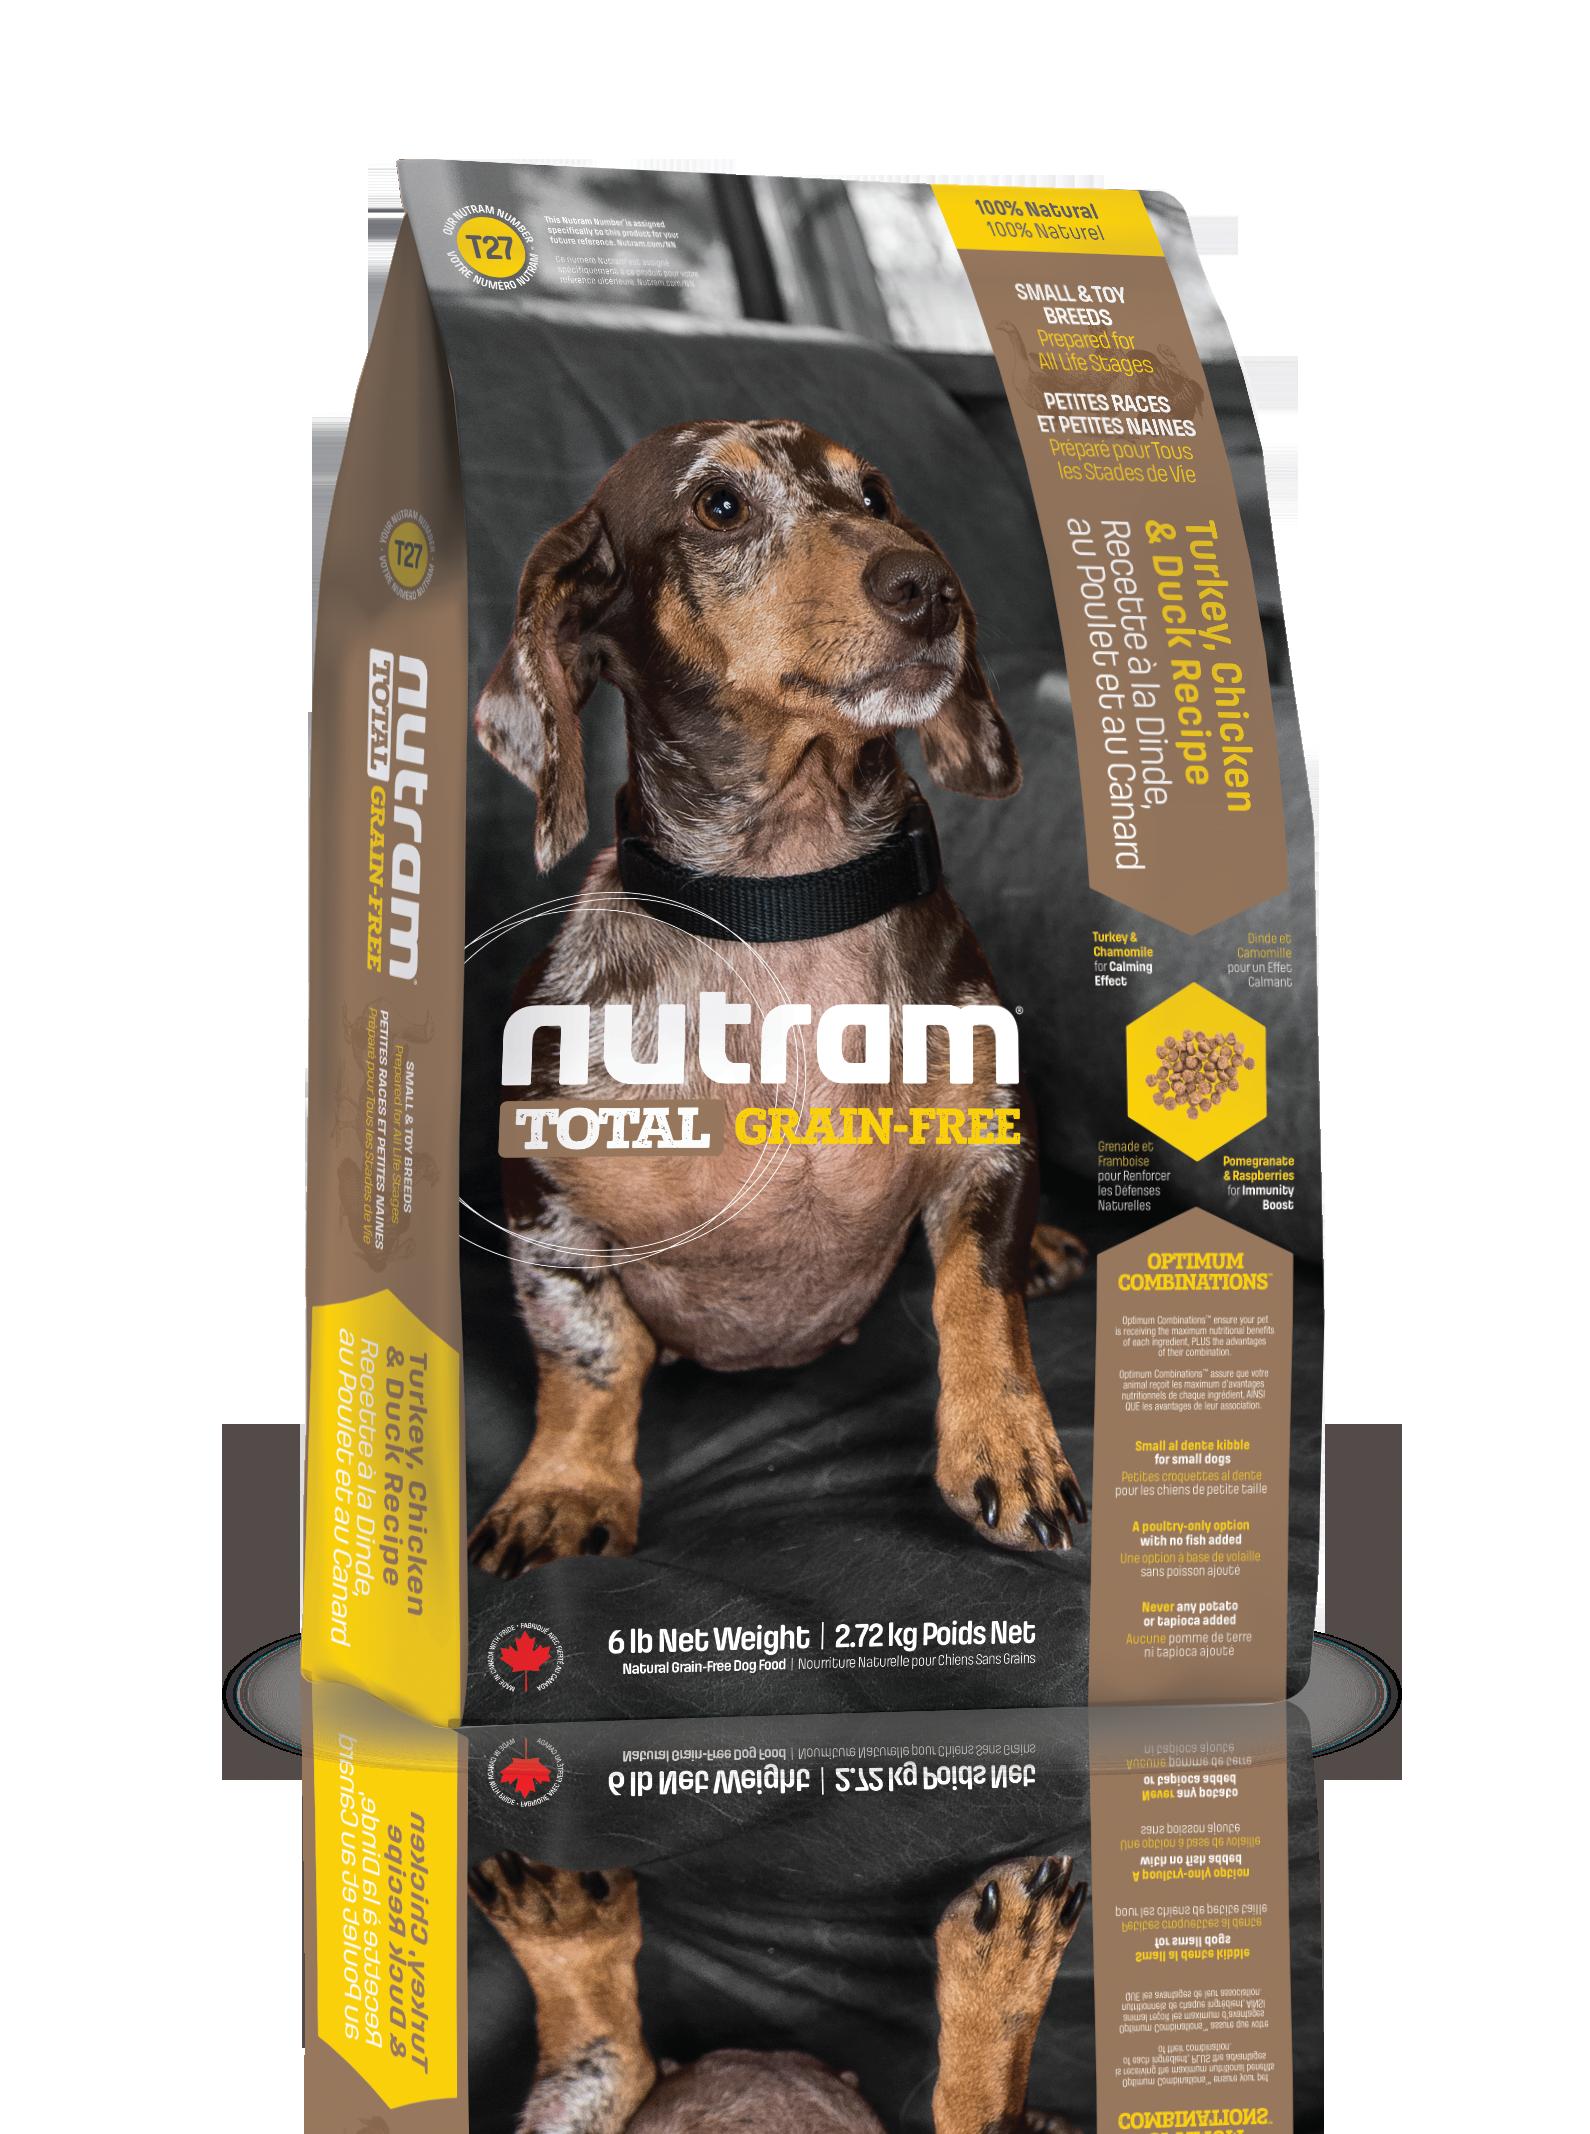 Pin On Nutram Dog Food